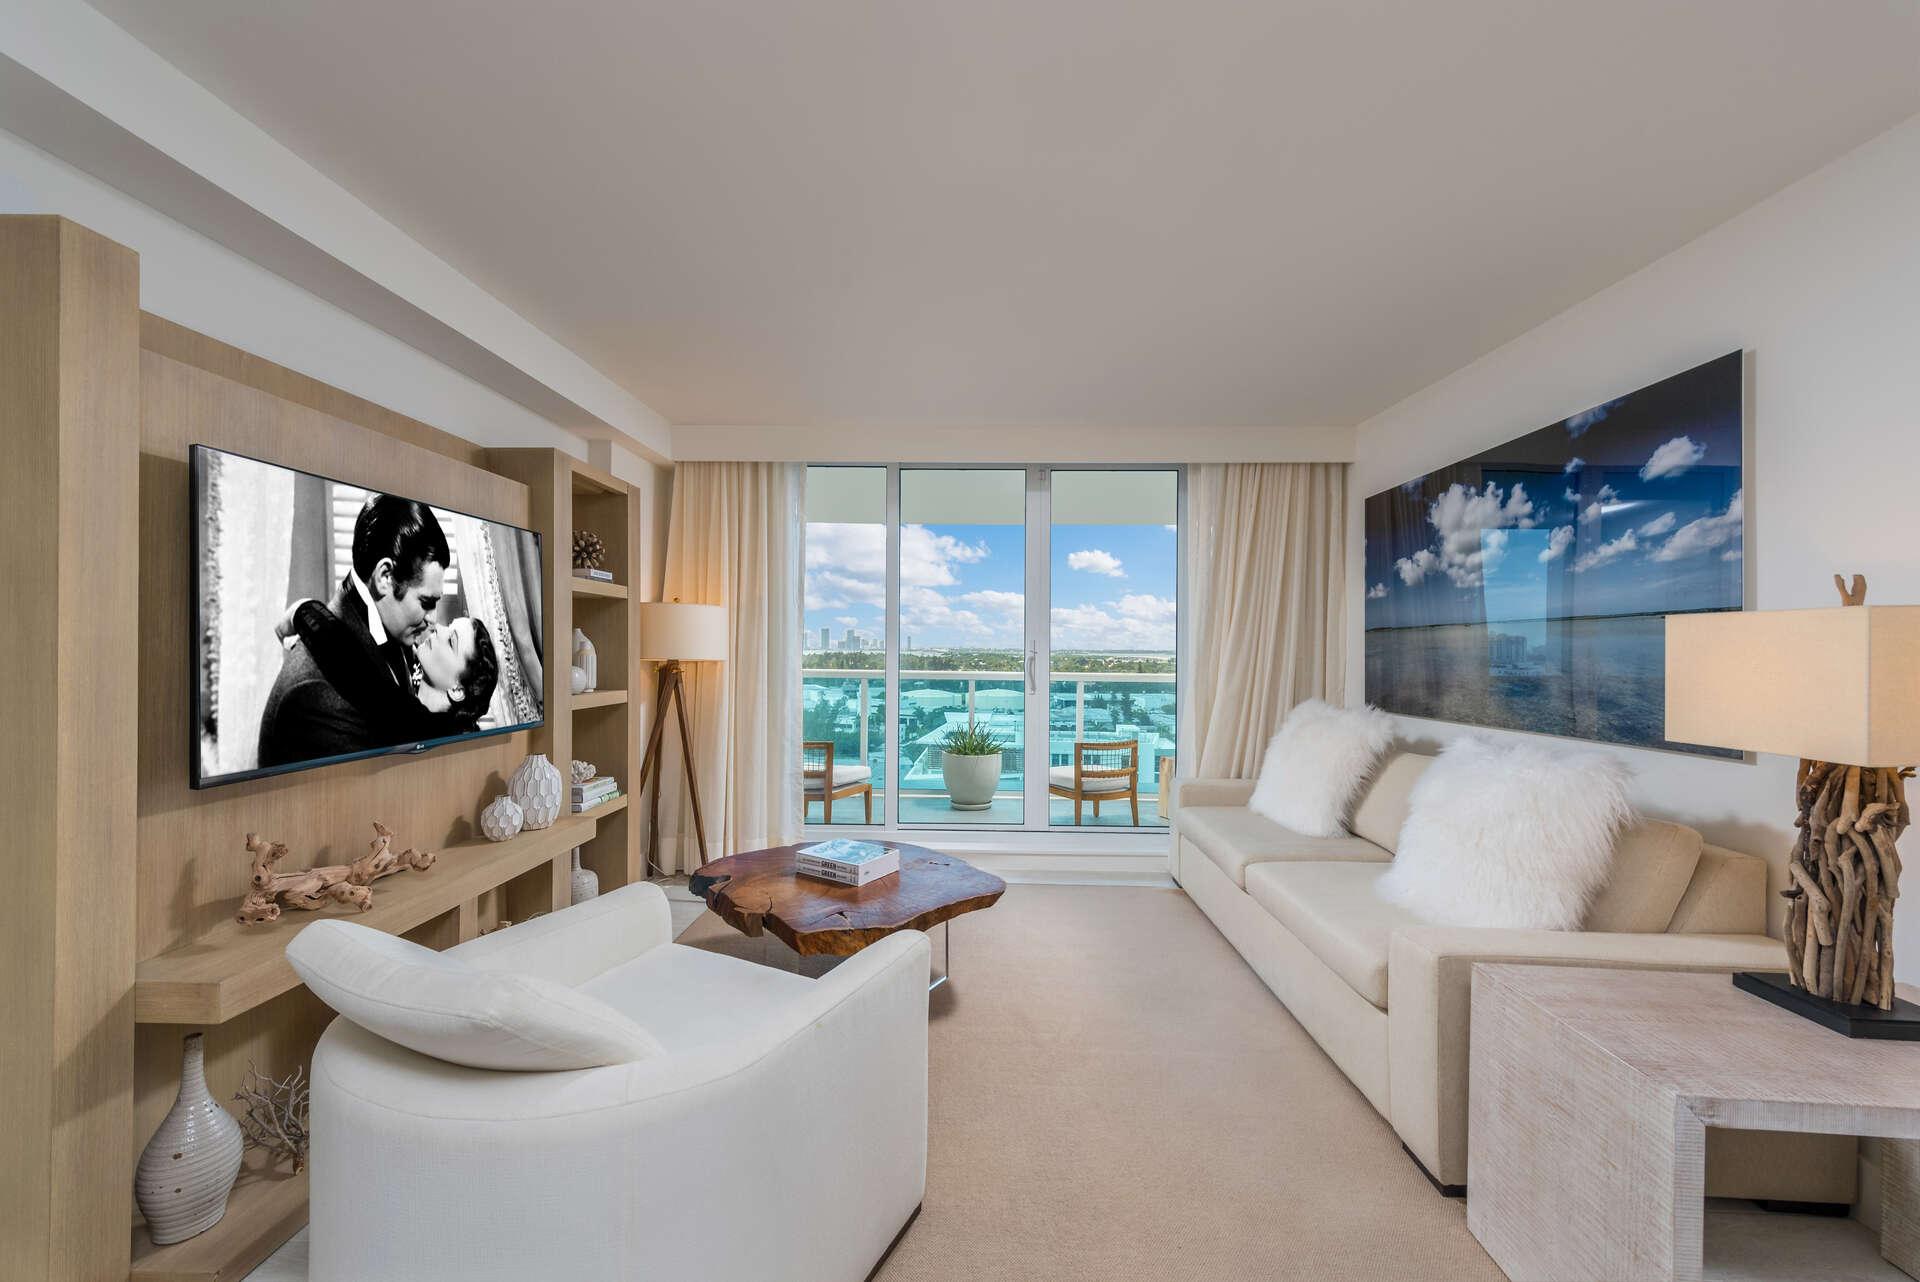 Luxury vacation rentals usa - Florida - Miami beach - Eco hotel southbeach - #1445 | 2 BDM City View - Image 1/16